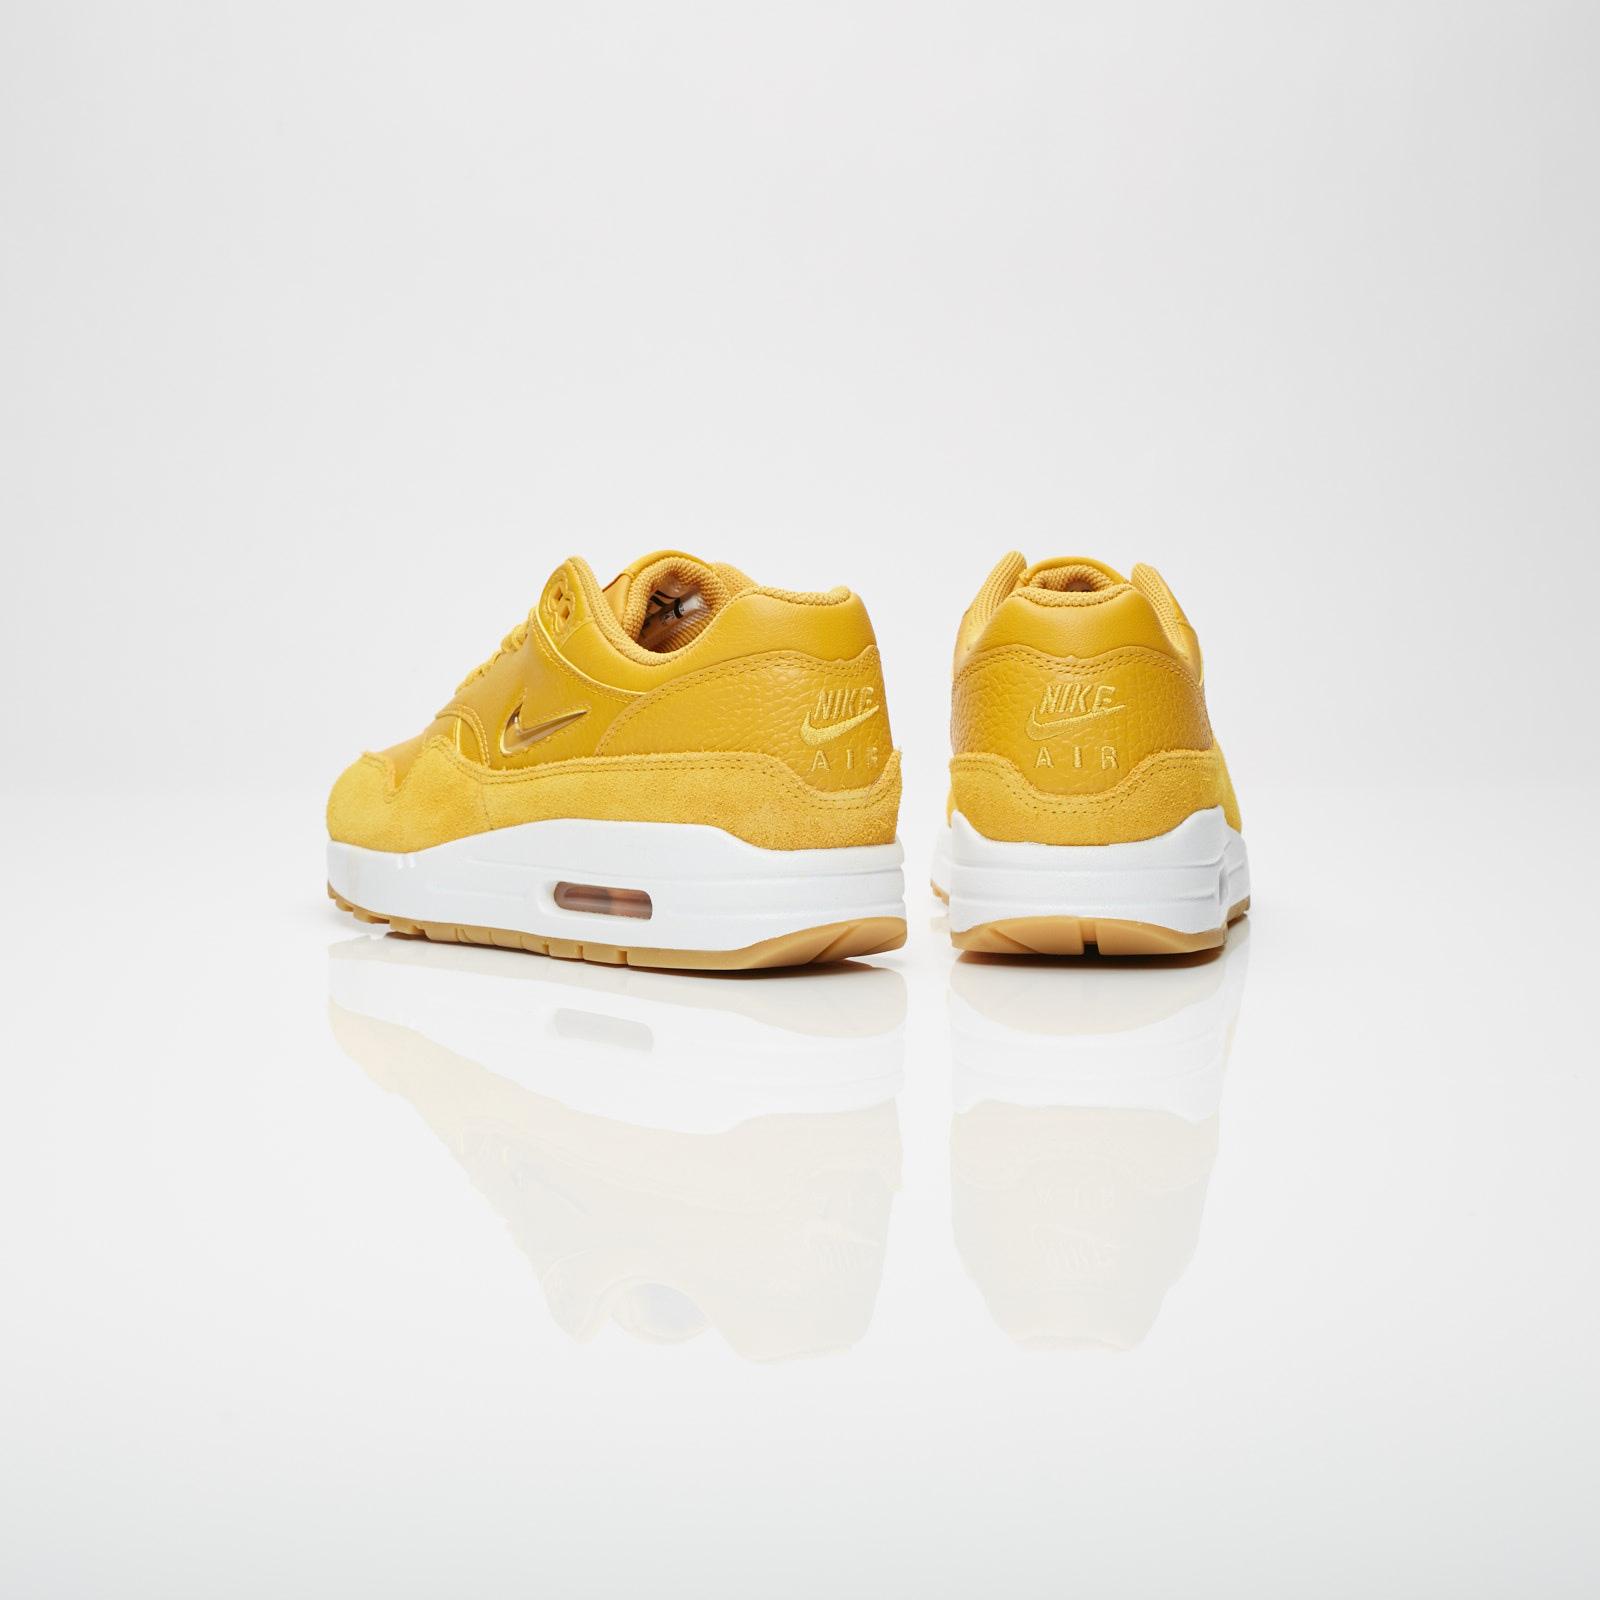 best service 7f6c2 df950 ... Nike Sportswear Wmns Air Max 1 Premium SC ...